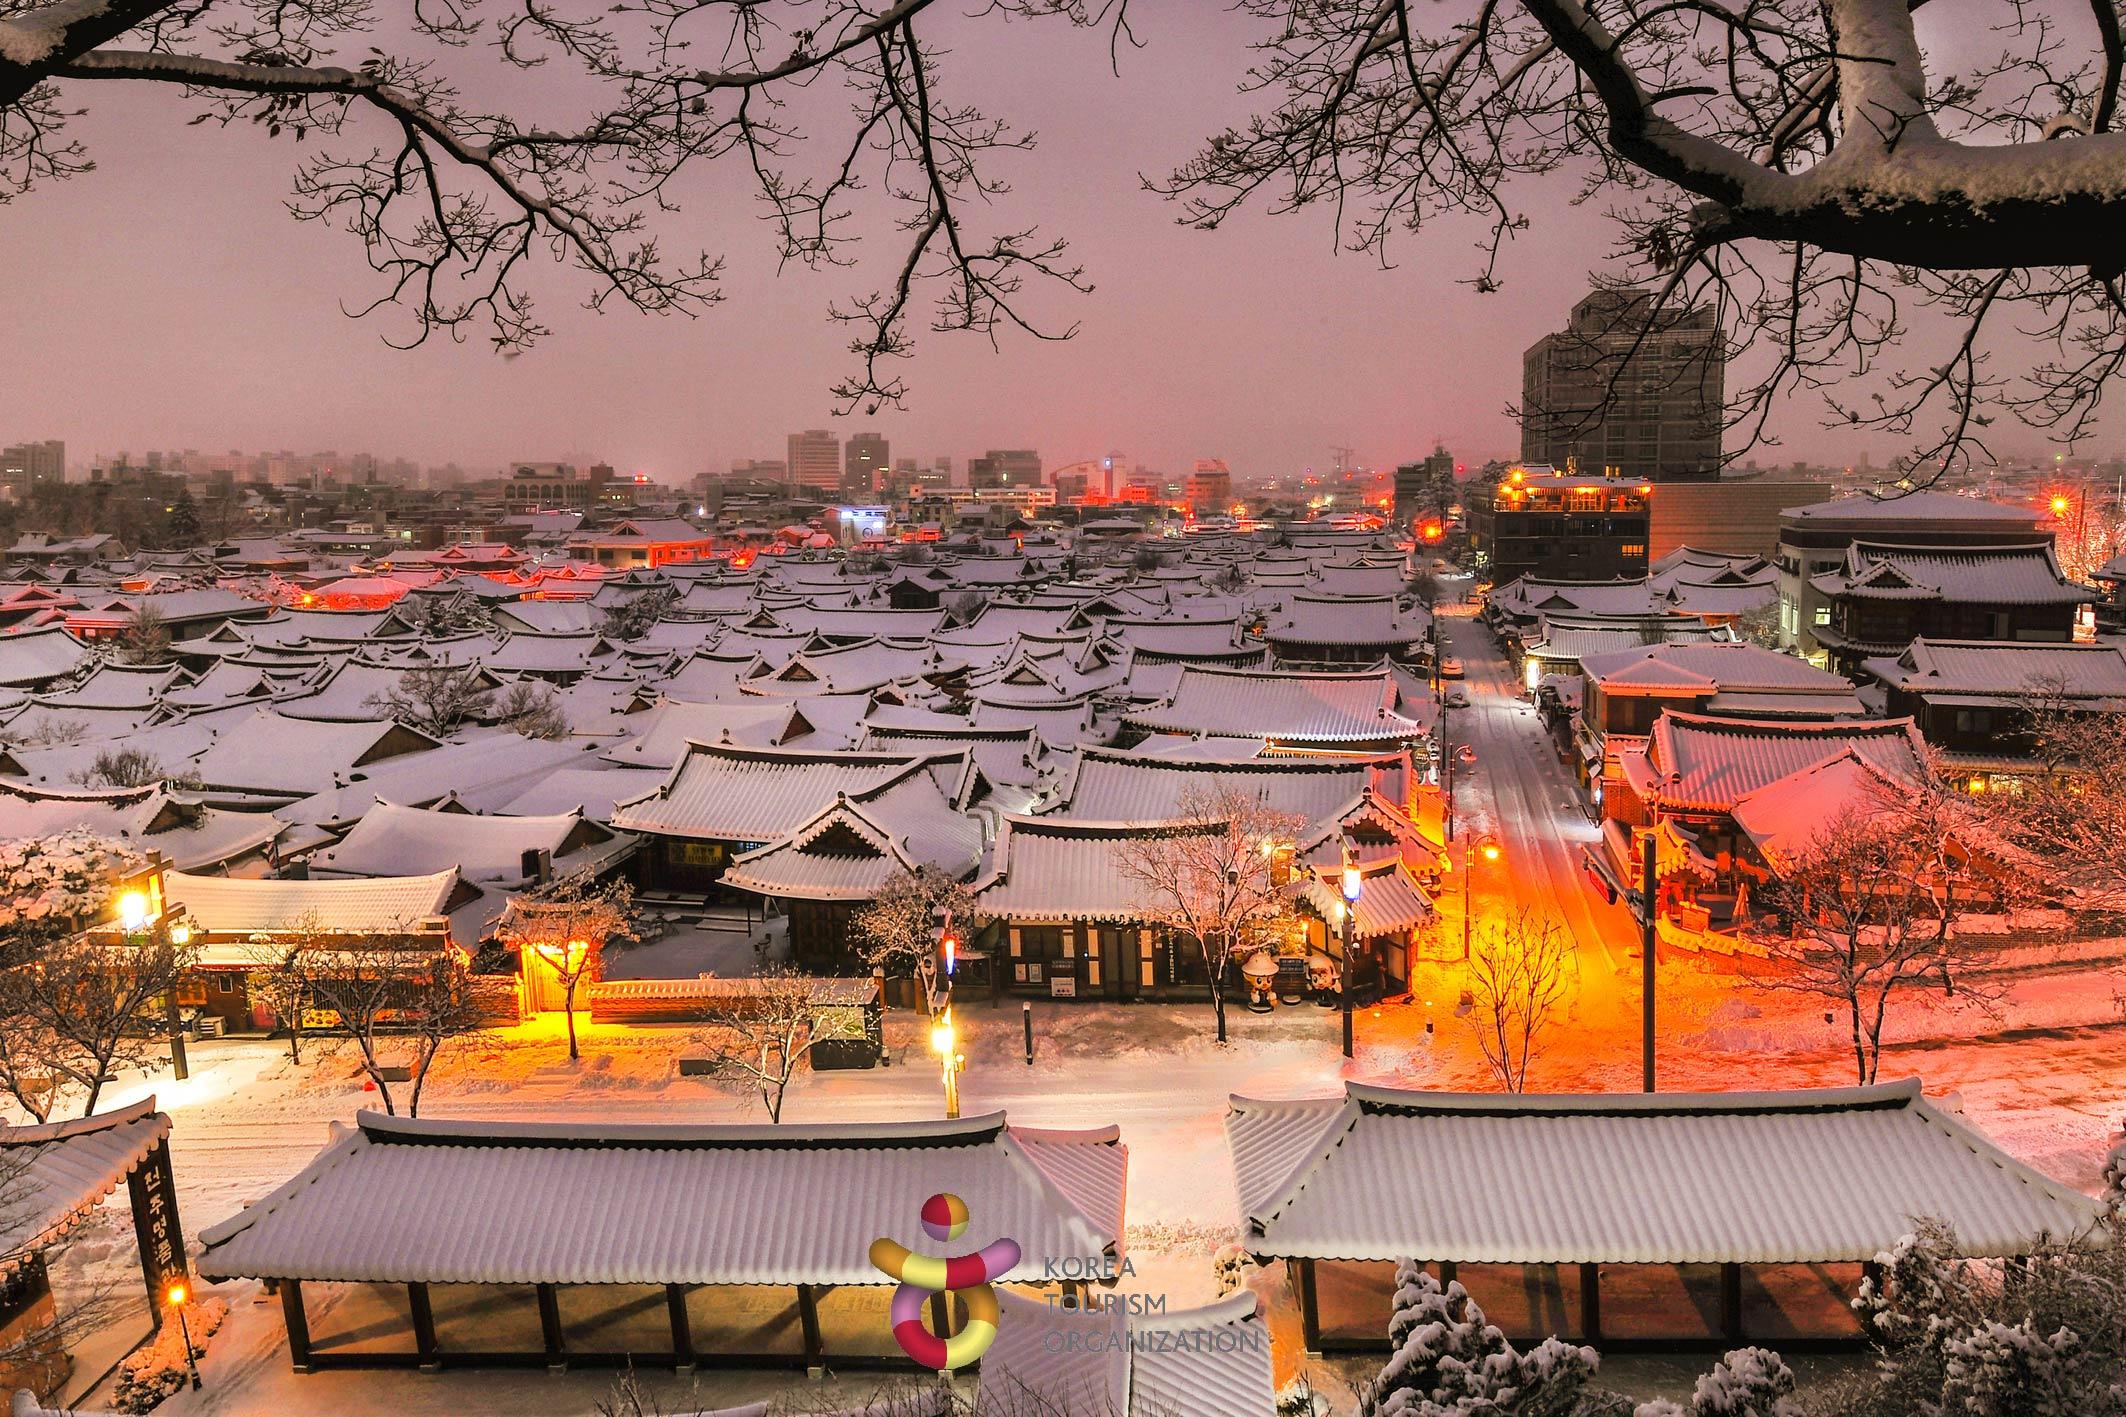 3820147201900019k_Hanok Village in Winter Dawn